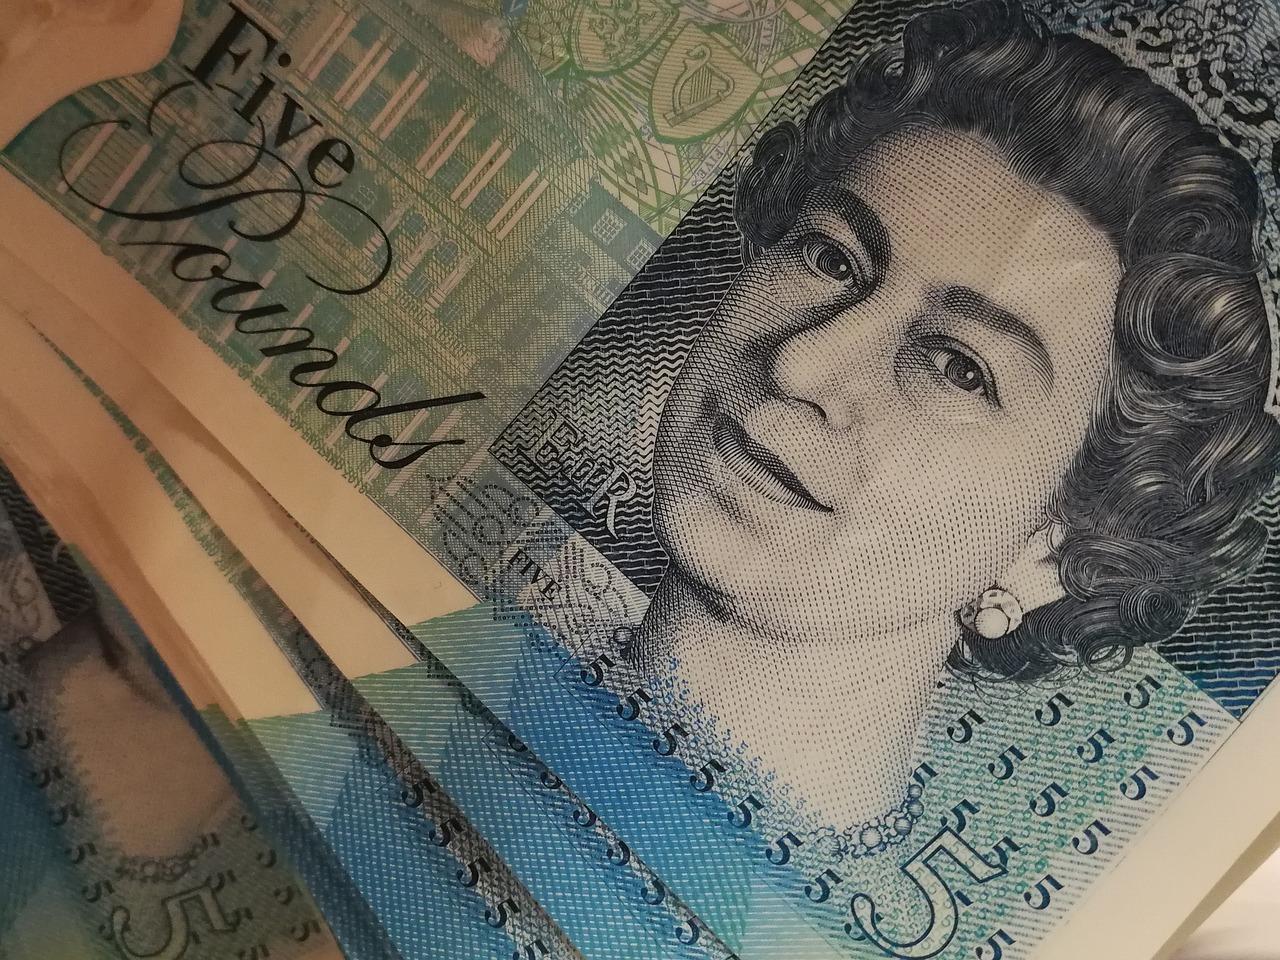 Pound Stirling